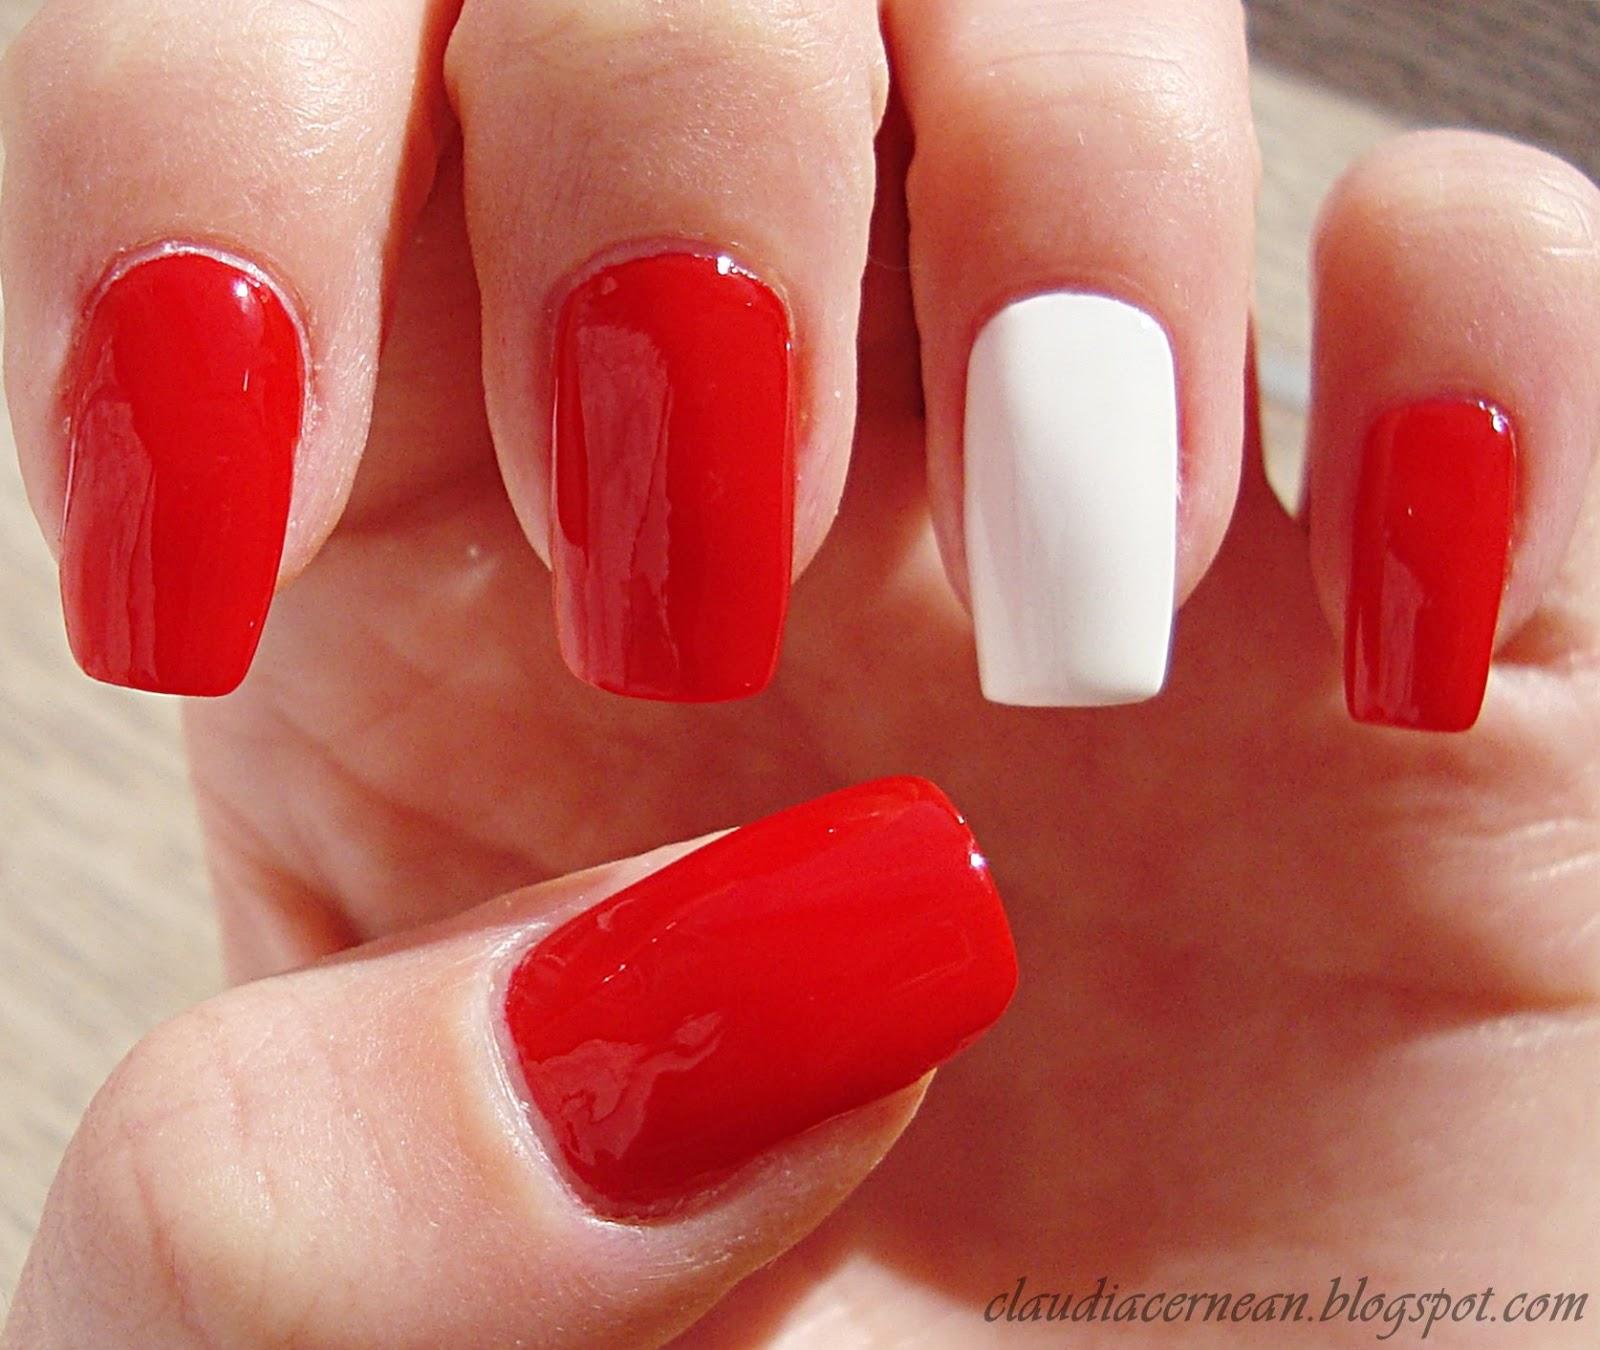 Red Nail Polish On Thumb: Nails Art Tutorials: Unghii Rosii Cu Inima